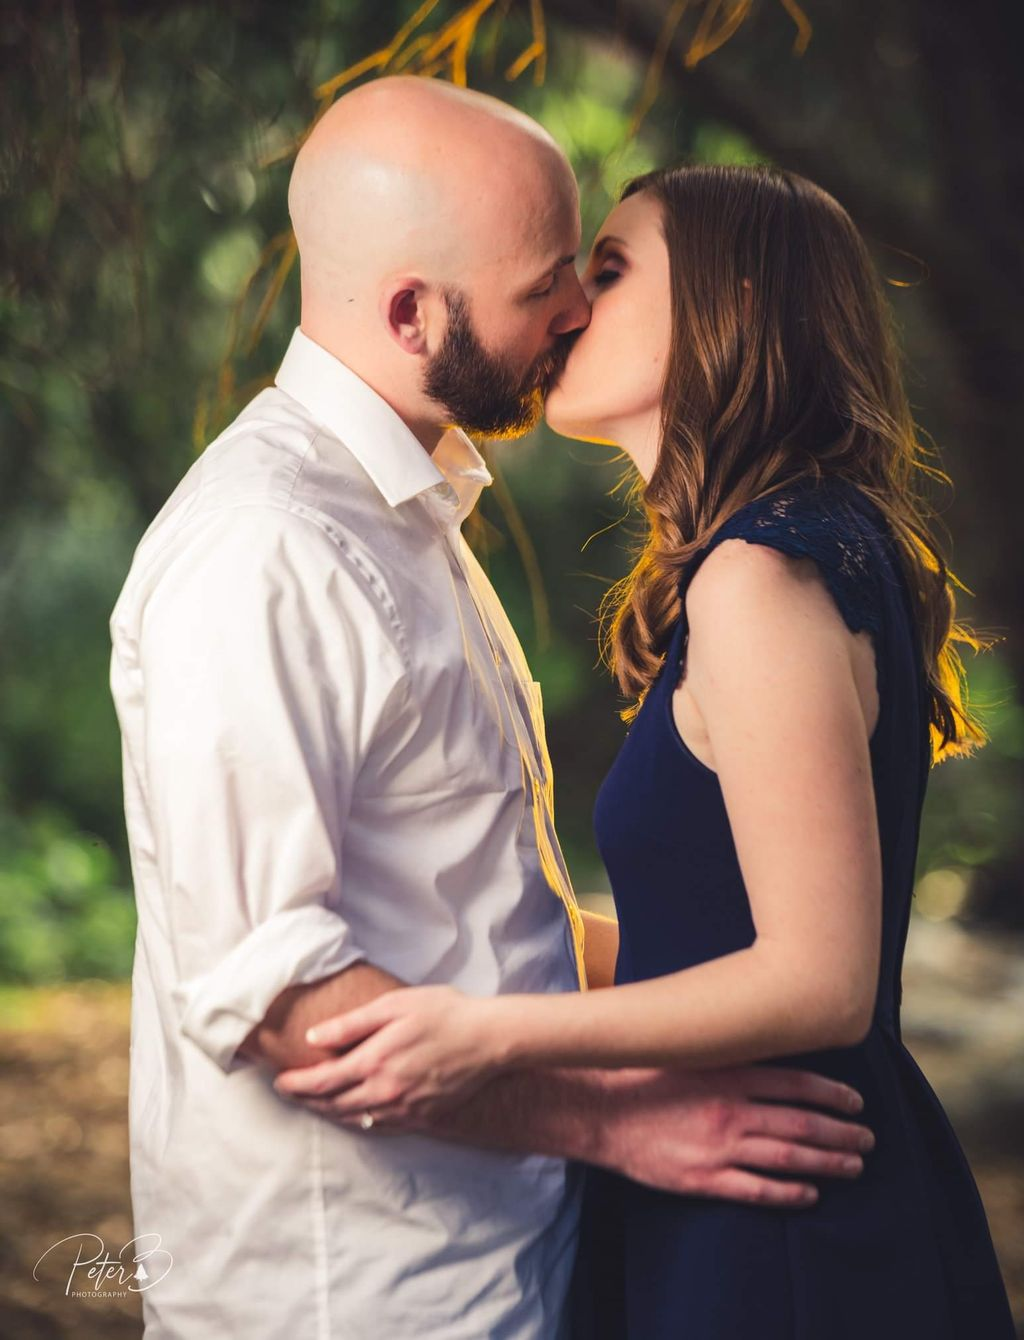 Jason & Deanna Engagement - 1 hour - Oak Canyon in Anaheim